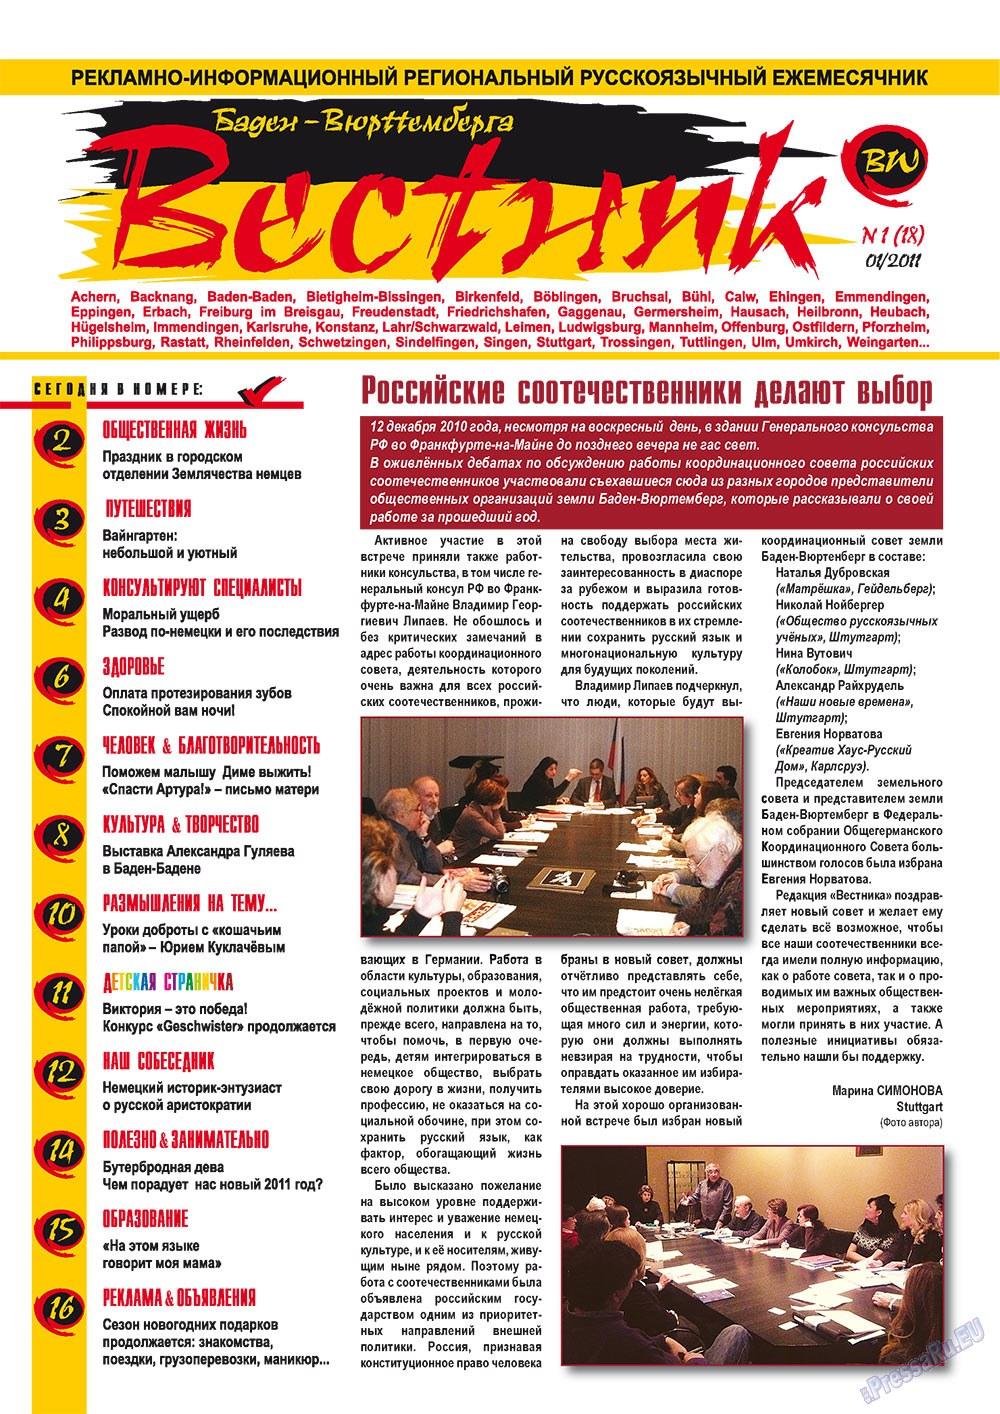 Вестник-info (журнал). 2011 год, номер 1, стр. 1